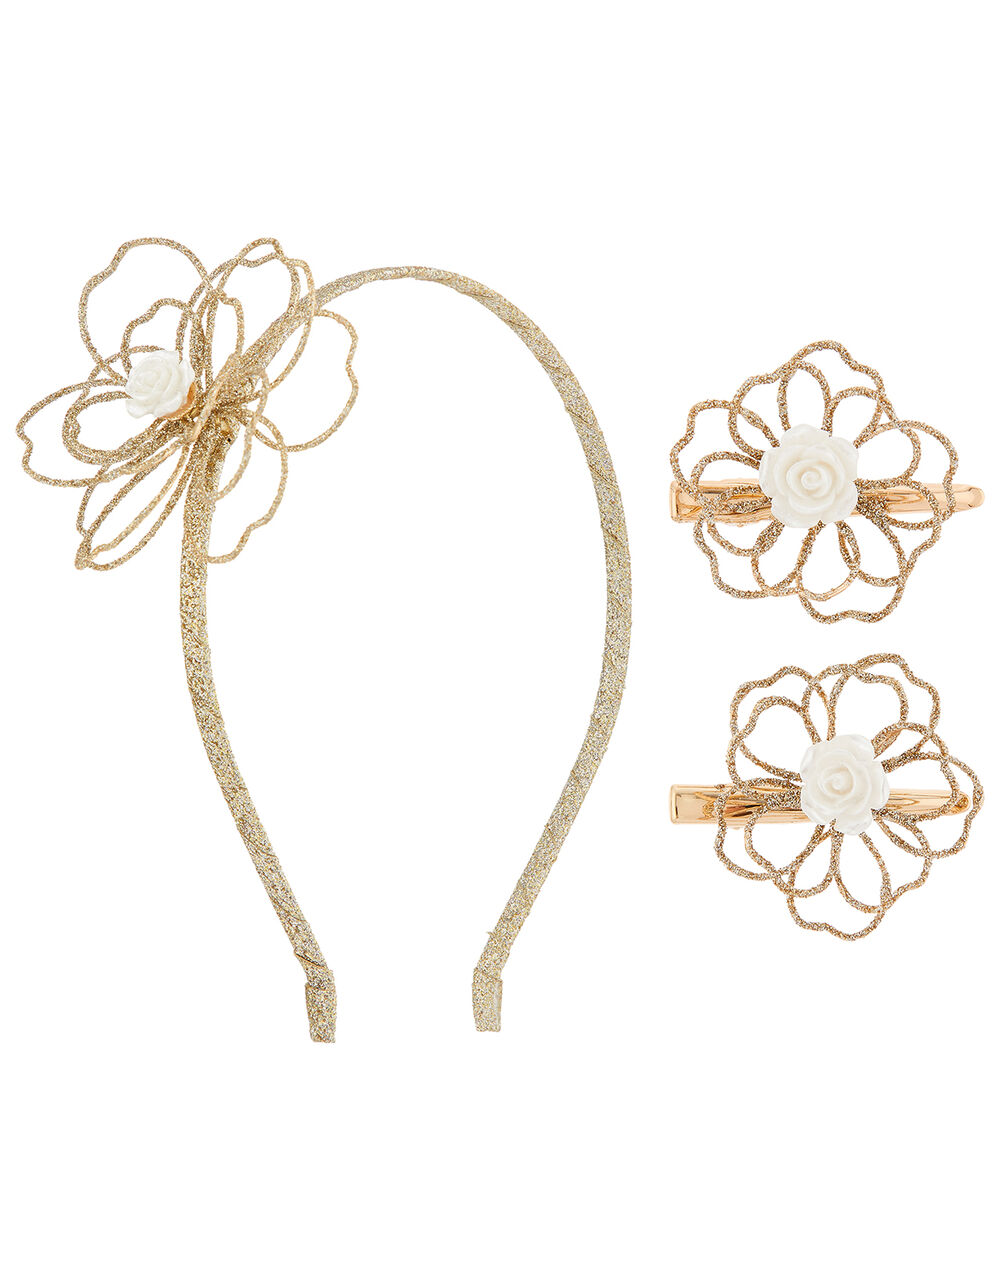 Amelia Glitter Flower Hair Accessory Set, , large